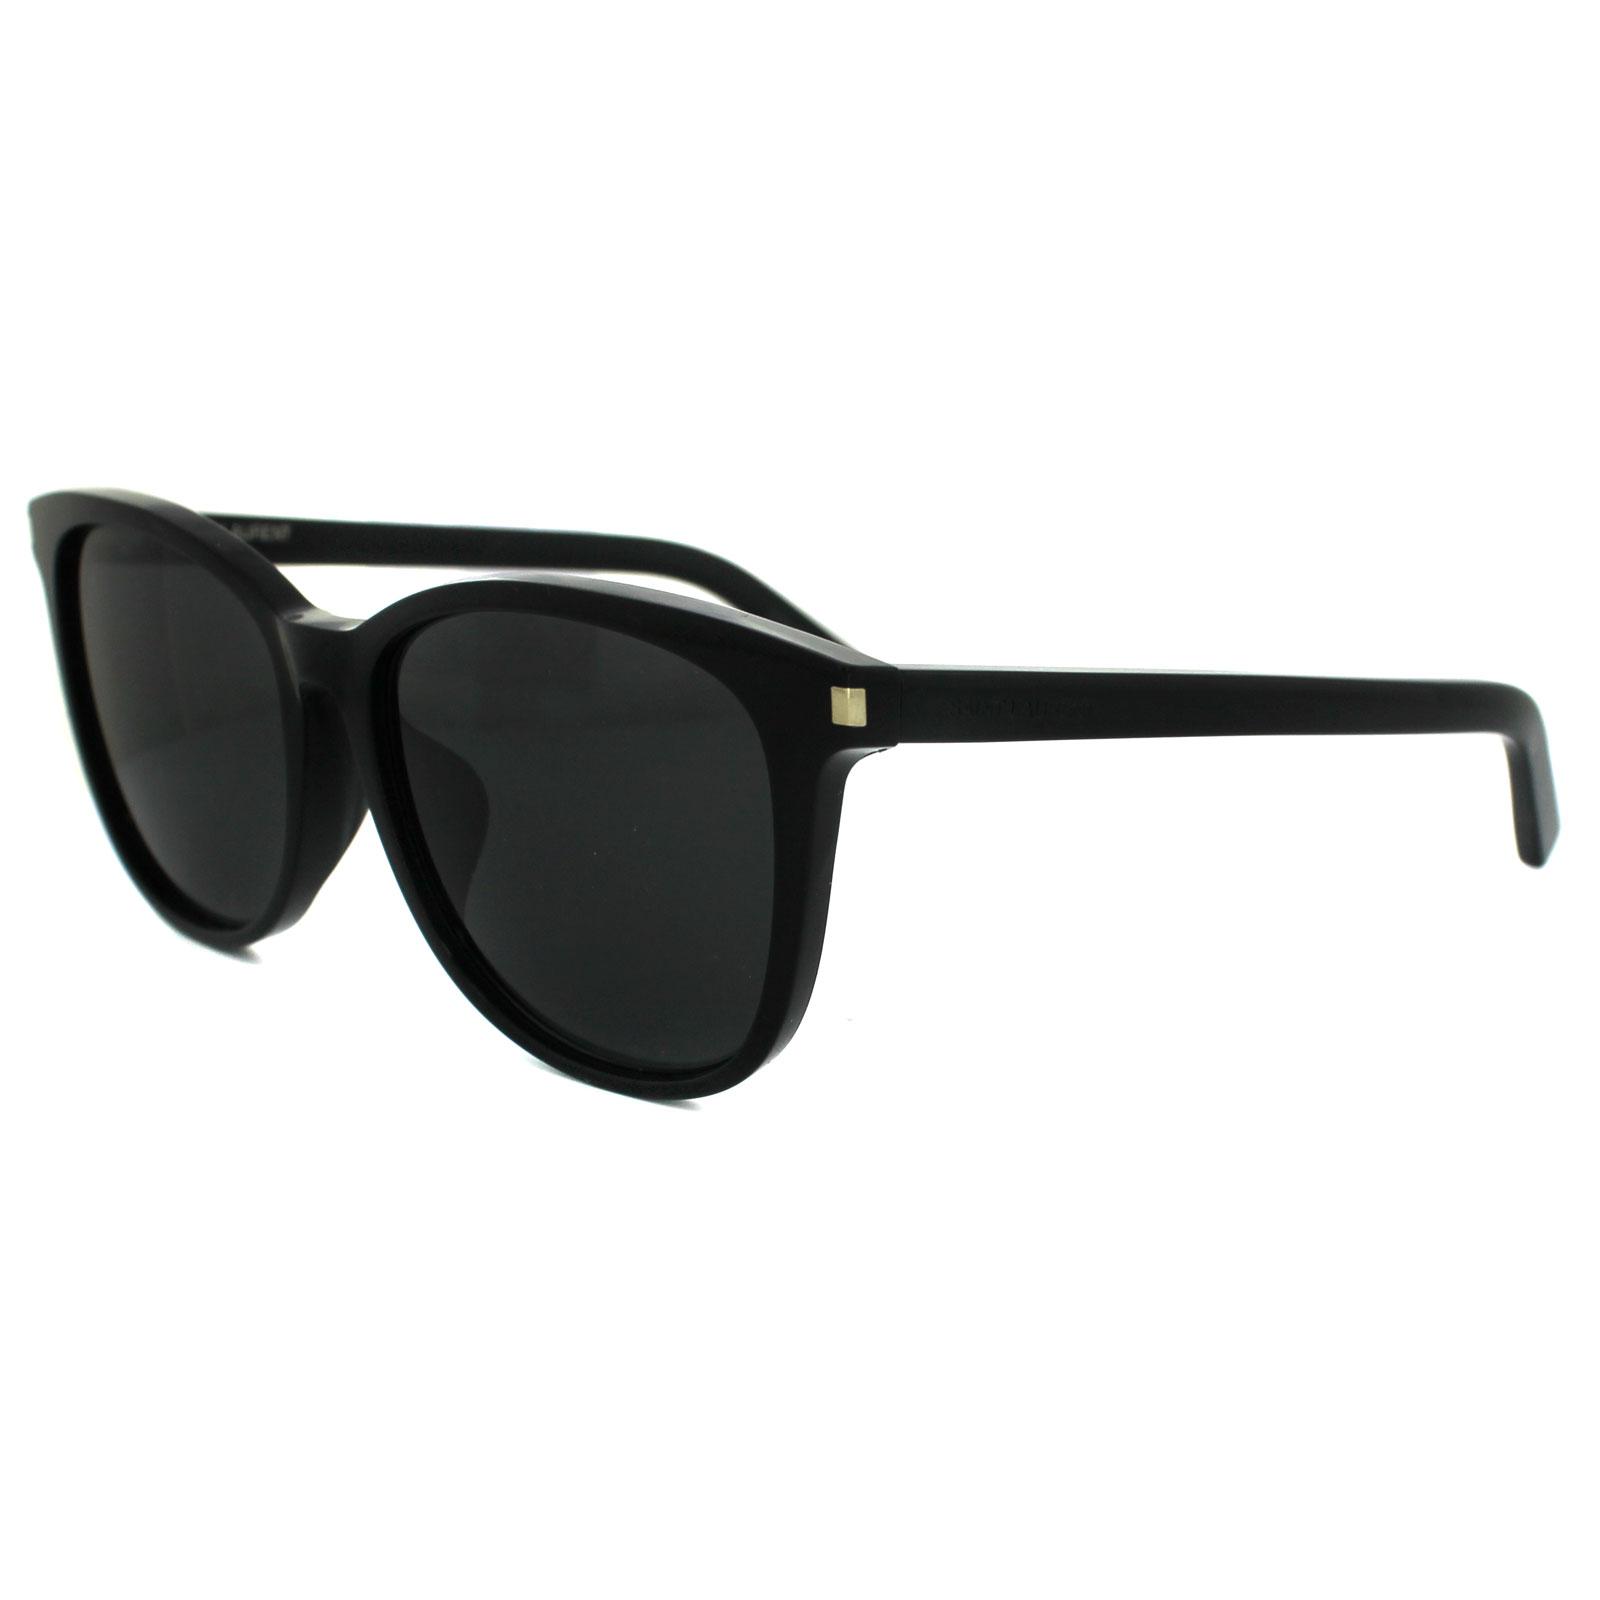 d7e63dd3ffc Cheap Saint Laurent SL 54 F Sunglasses - Discounted Sunglasses